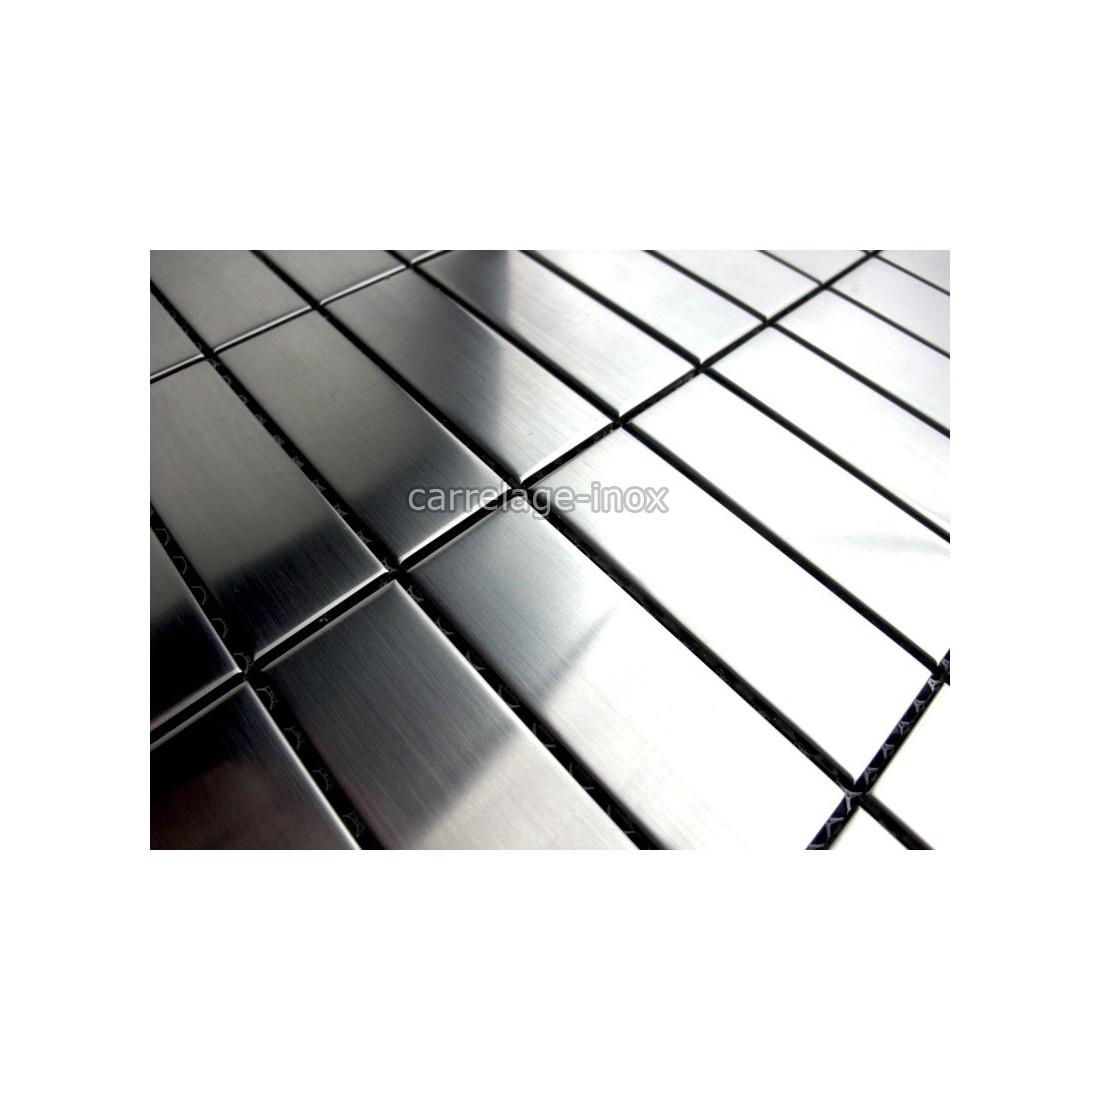 Mosaique inox modele regular 30 carrelage for Carrelage inox fr